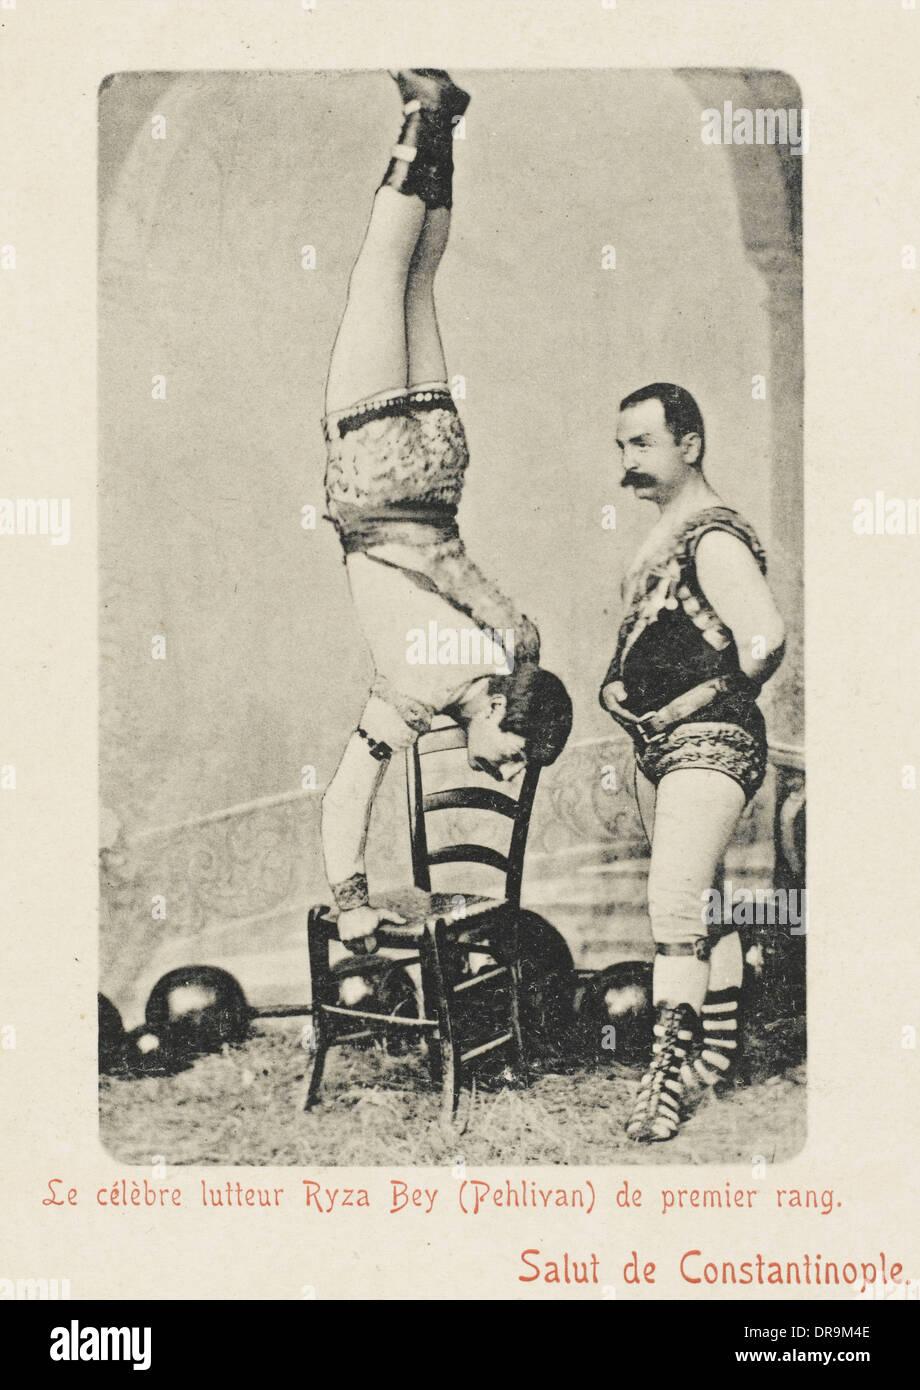 Turkish Wrestler (4 of 4) - Stock Image